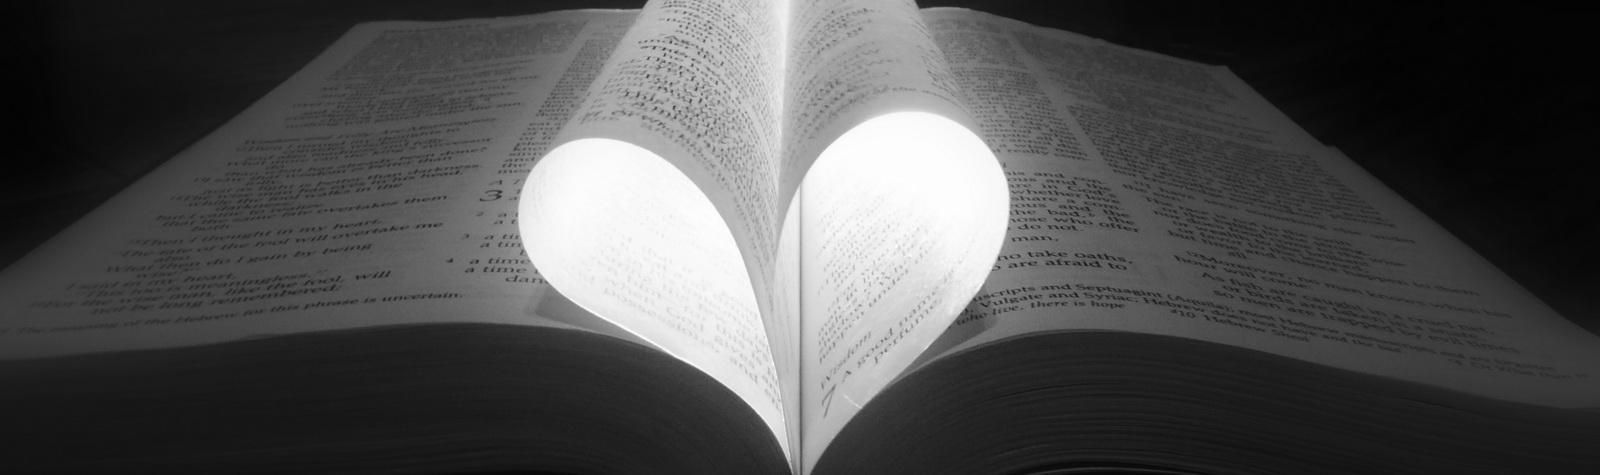 Self-Feeding and the Word